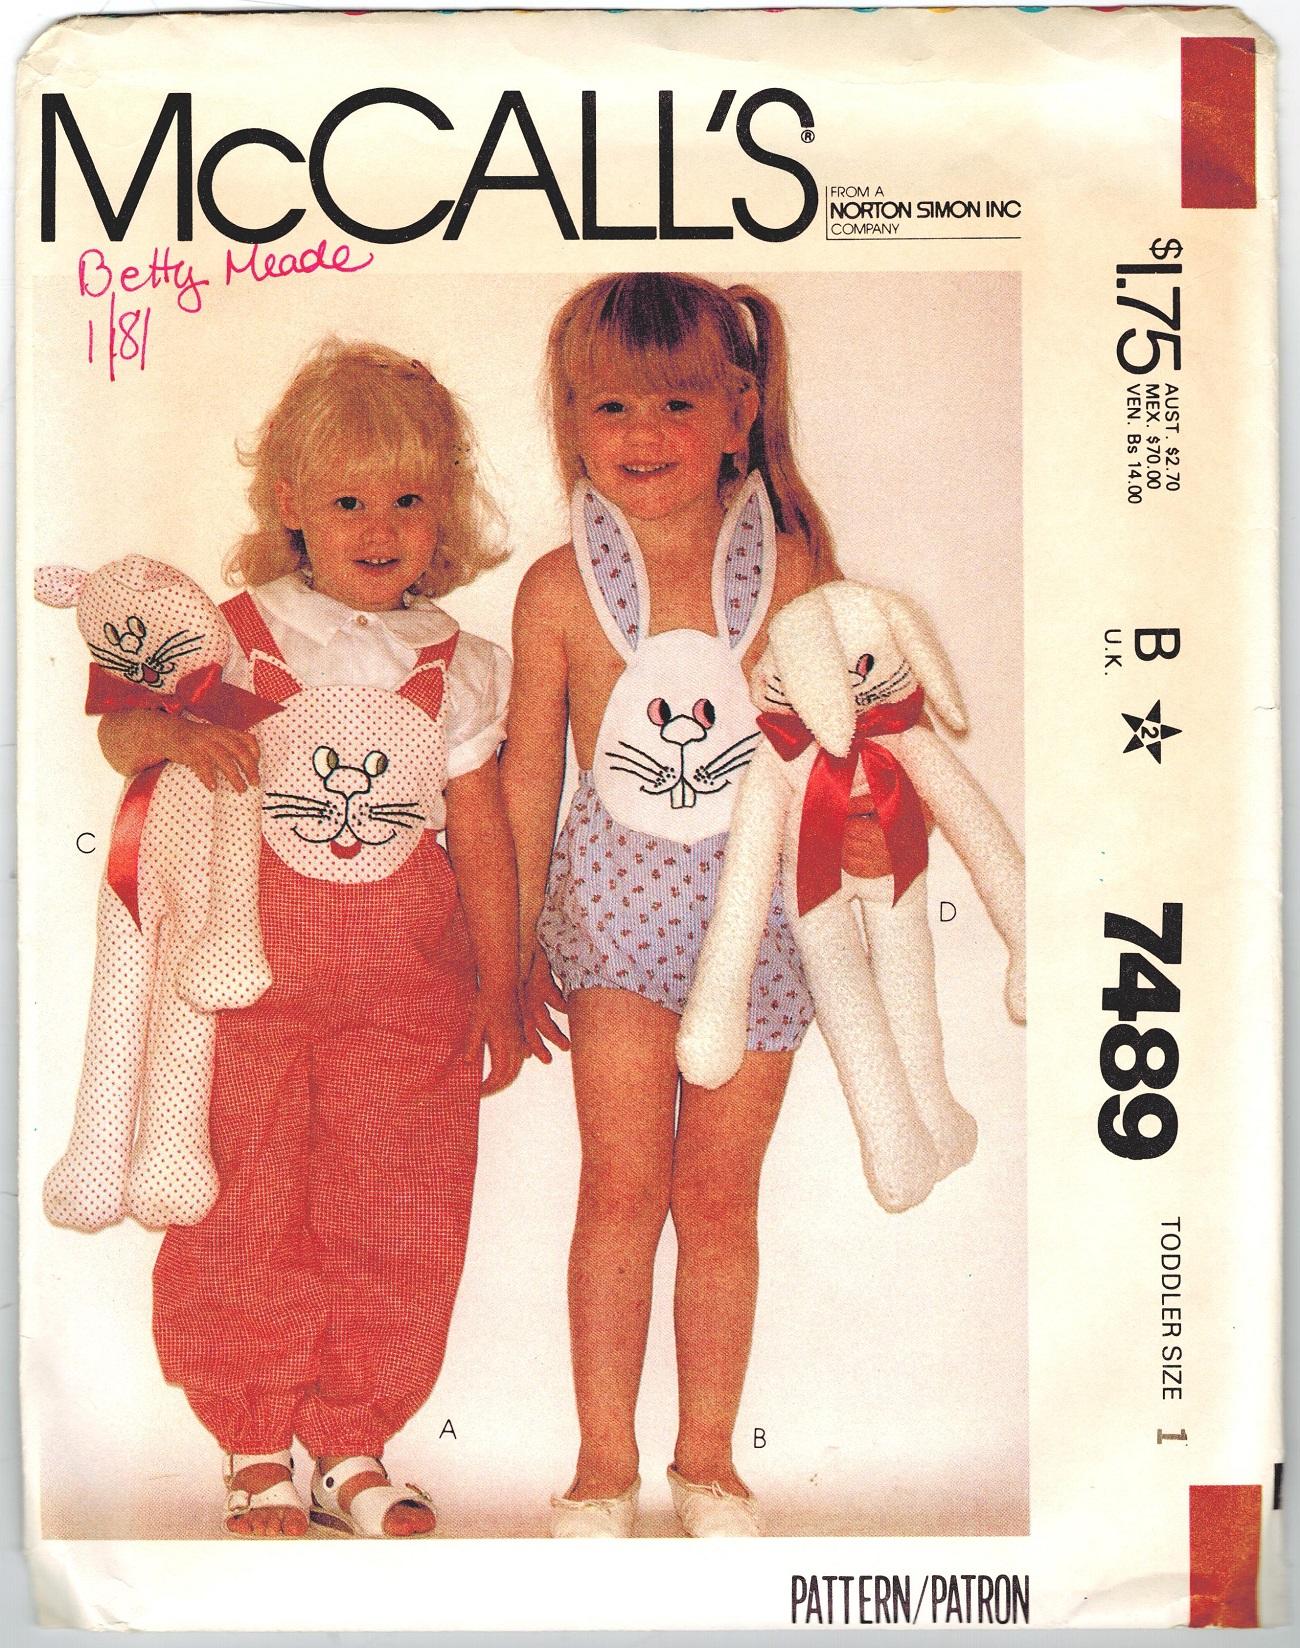 McCall's 7489 A